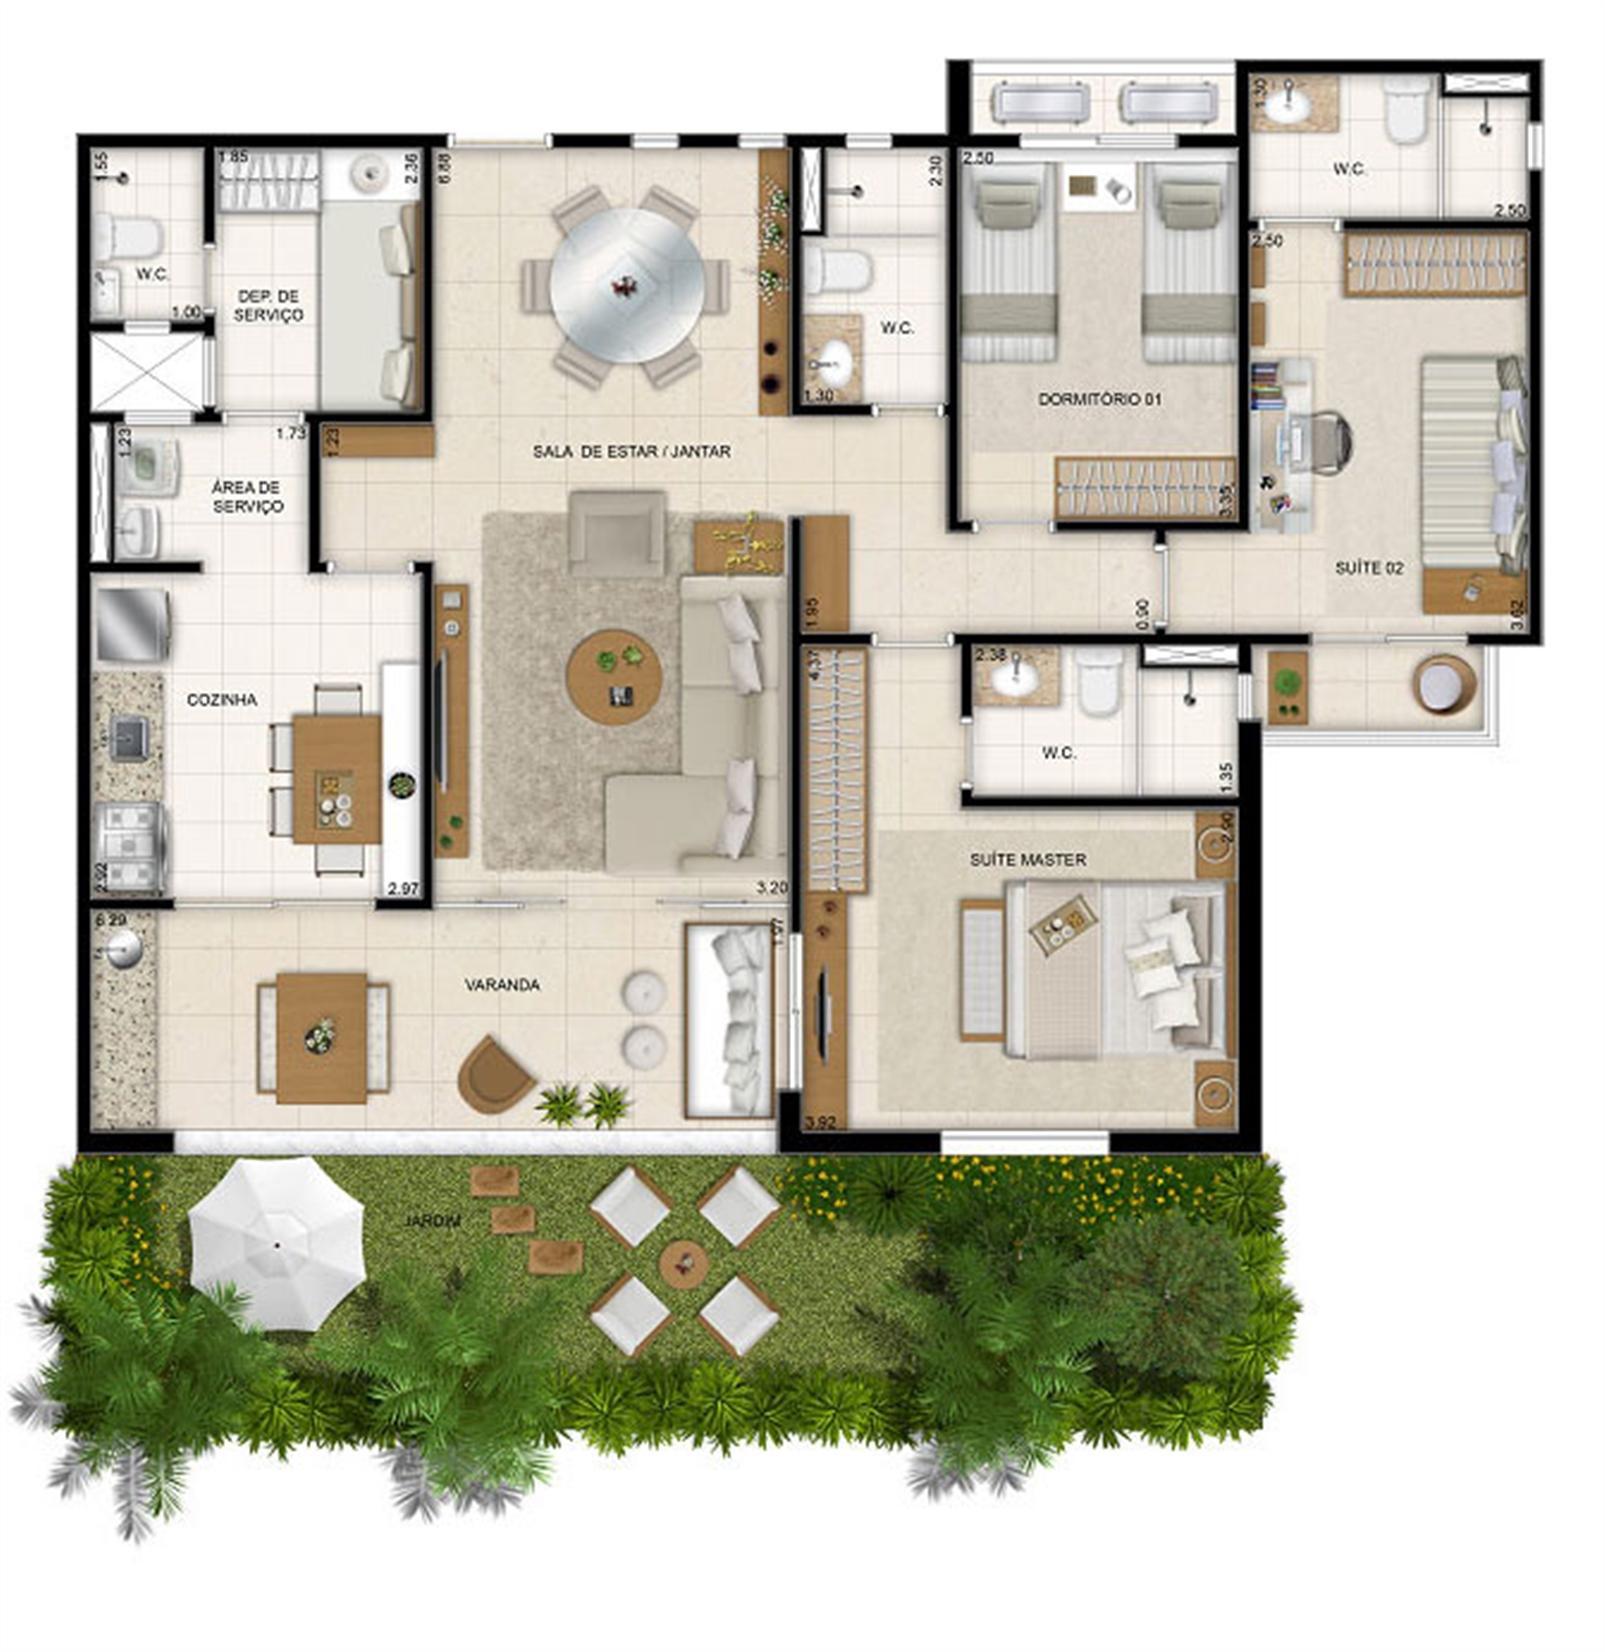 Perspectiva ilustrada da planta Mason Makani 113 m² | Mandara Kauai – Apartamentono  Porto das Dunas - Aquiraz - Ceará